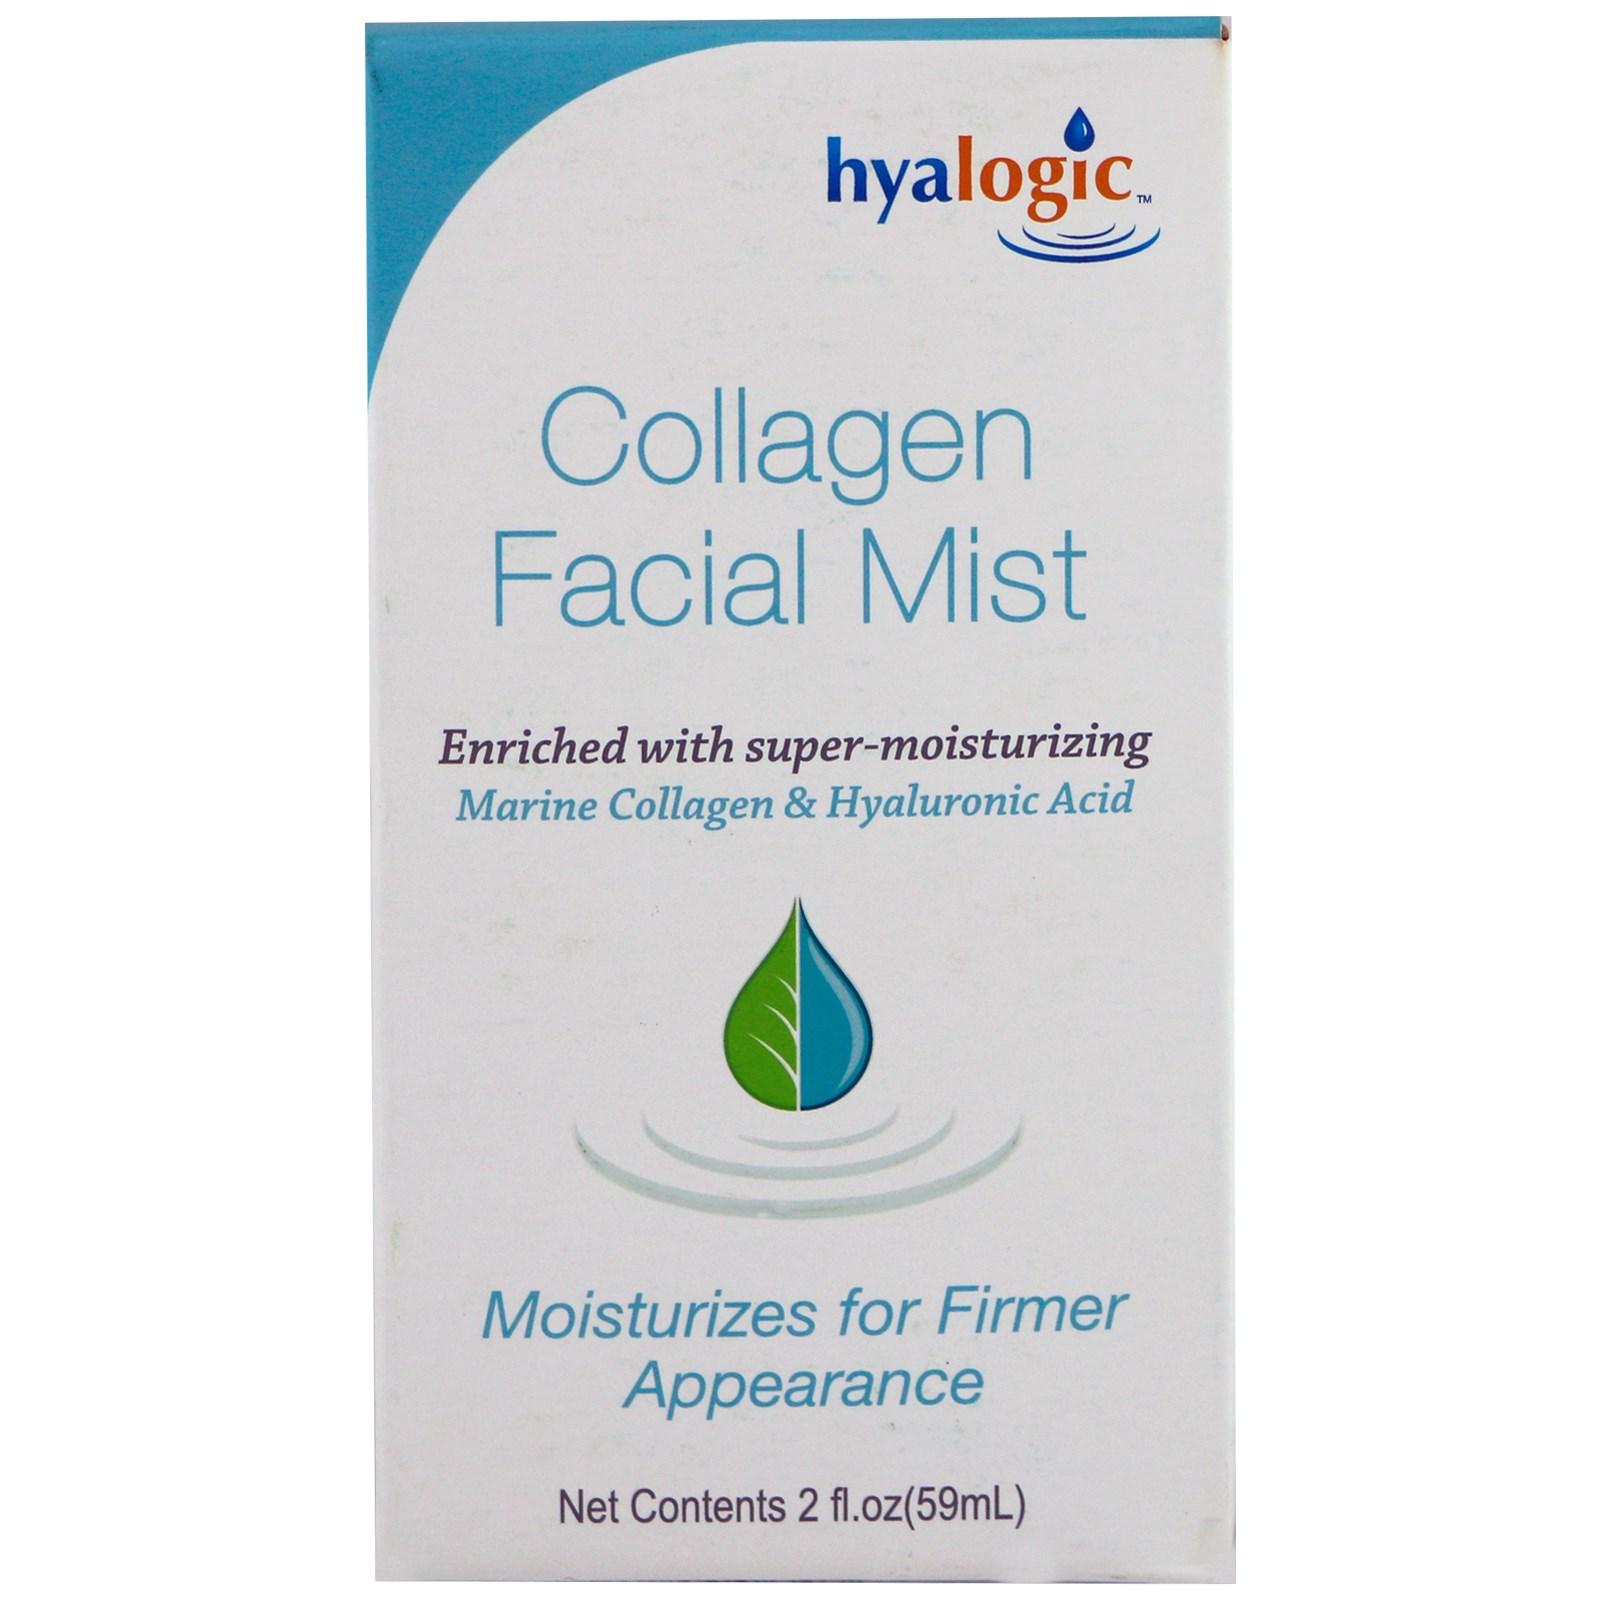 Hyalogic Ha Facial Mist 2 fl oz (59 ml) Liquid Restorative Face Oil - 0.96 fl. oz. by Desert Essence (pack of 6)